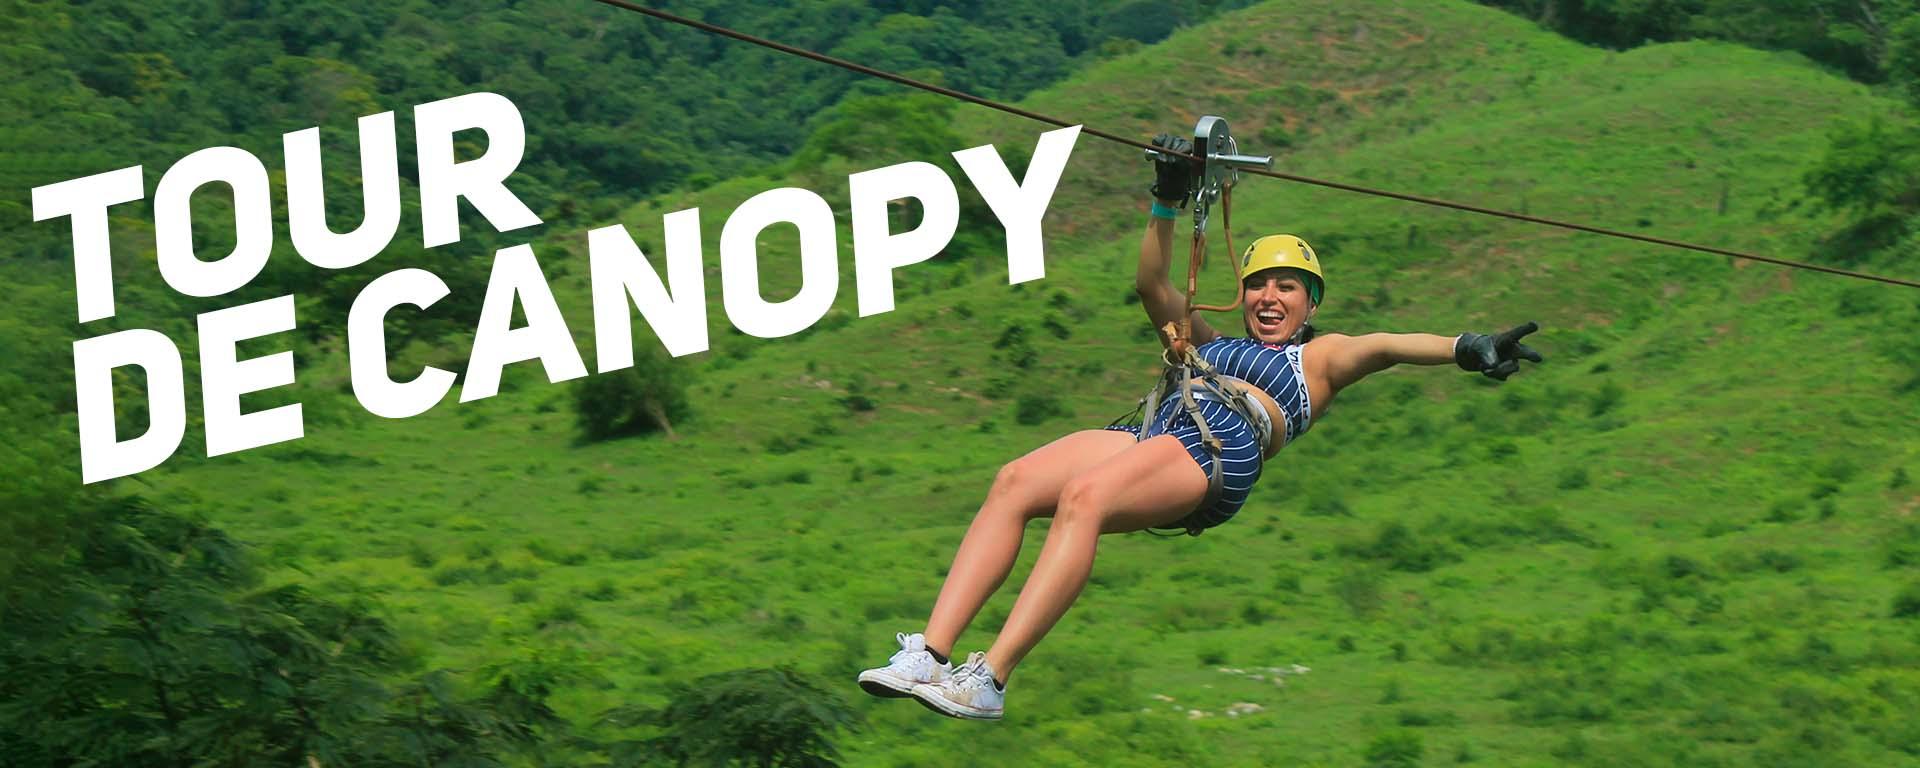 tour-rzr-canopy-adventures-canopy-puerto-vallarta-wild-treks-adventures-02-min